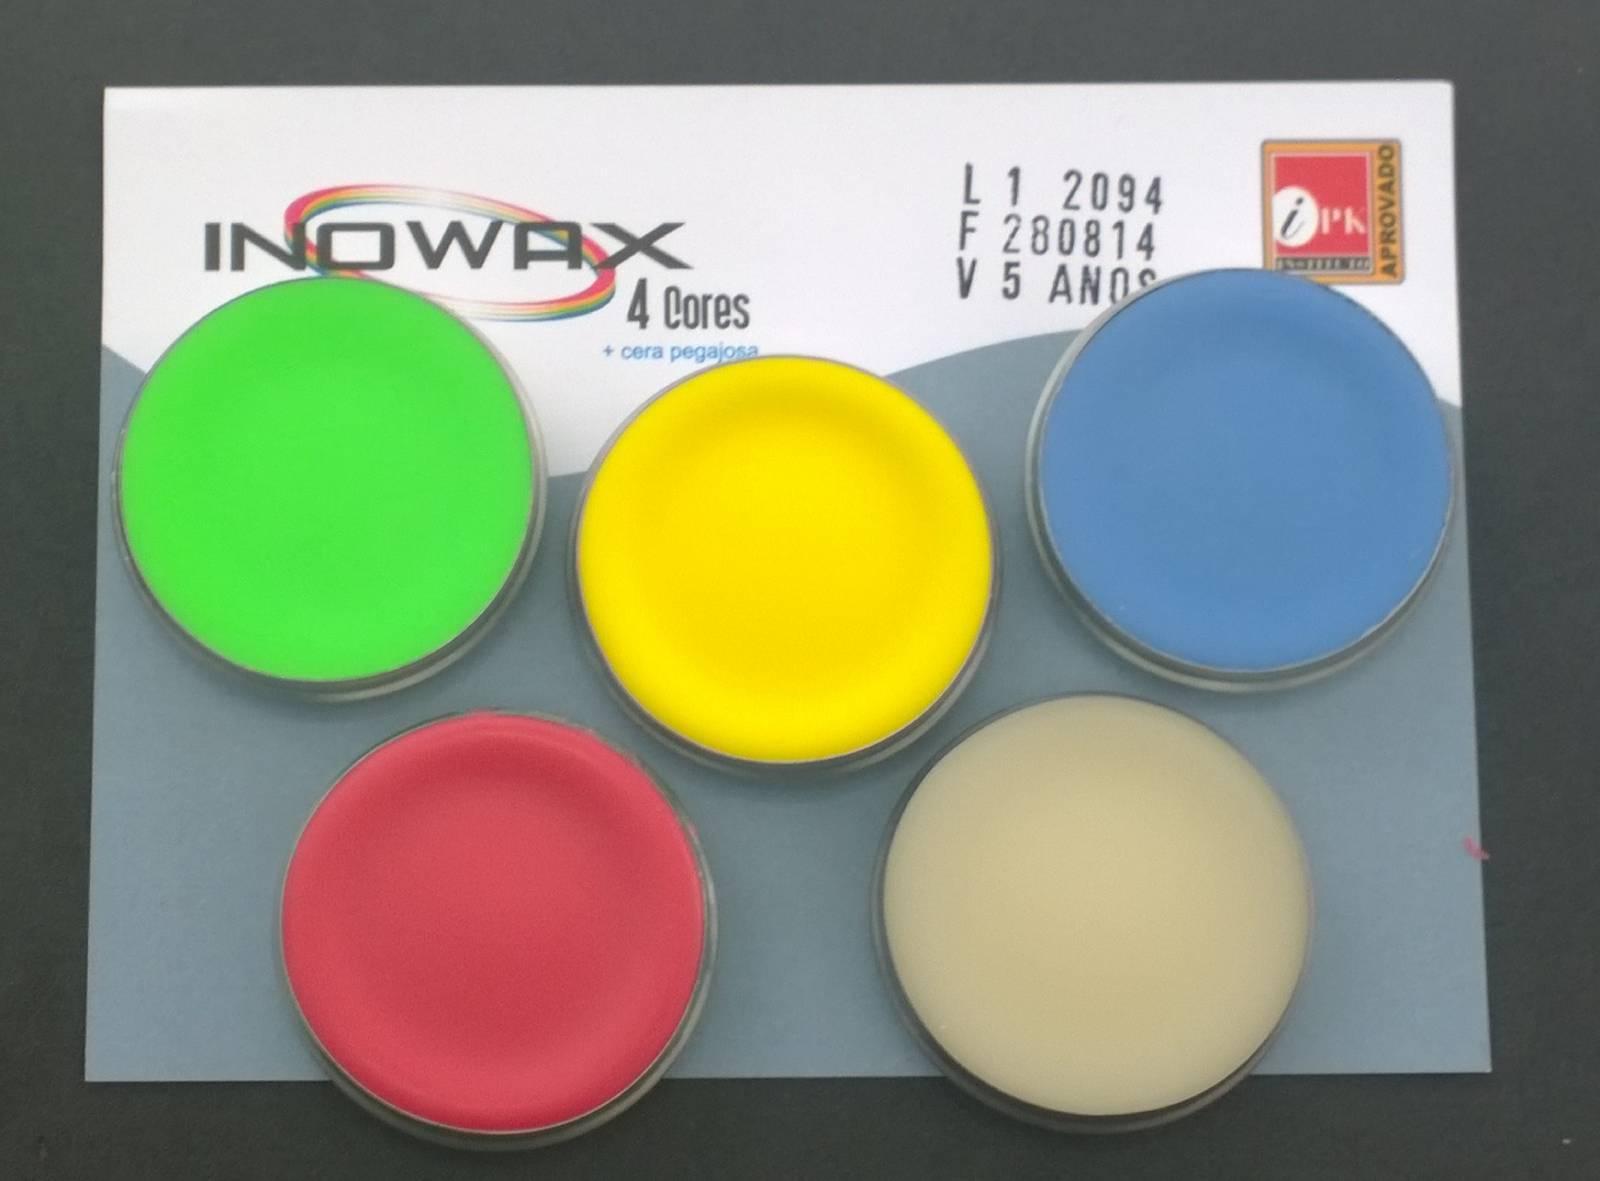 INOWAX-101030- kit 4 cores + pegajosa (sistema Peter Thomas)